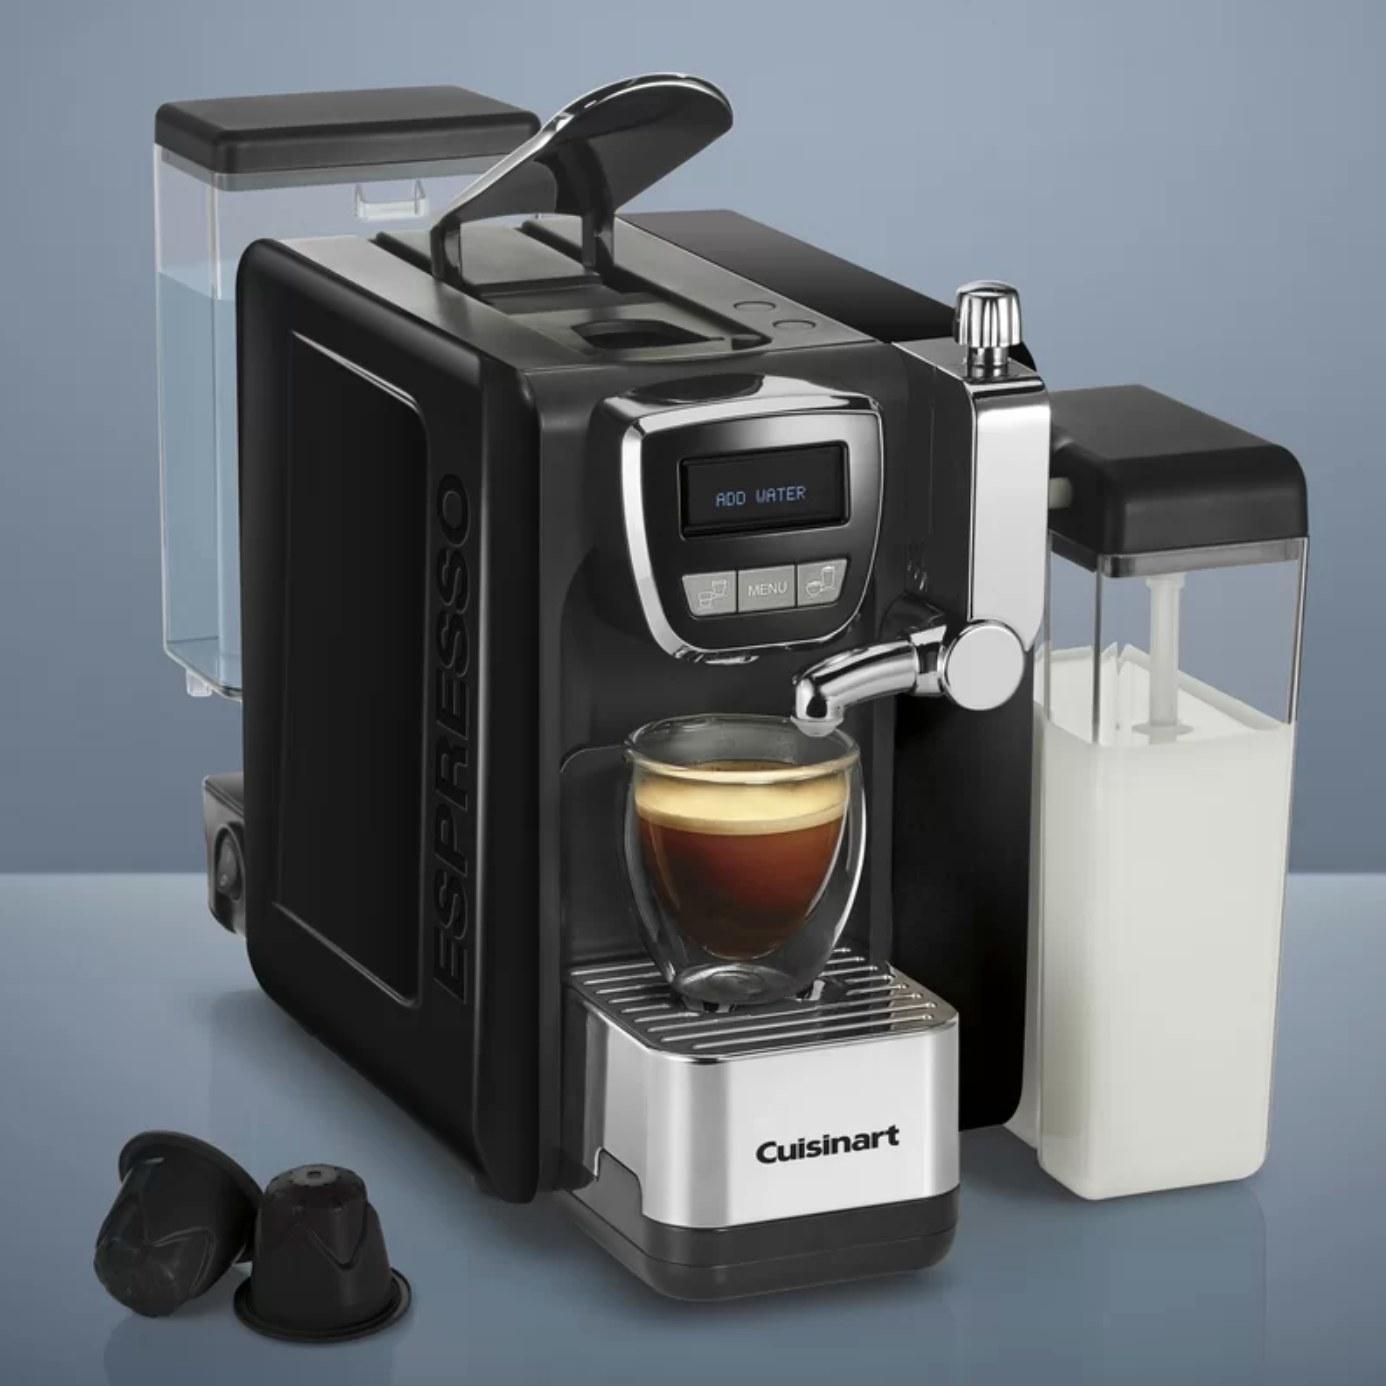 The Cuisinart espresso machine making coffee